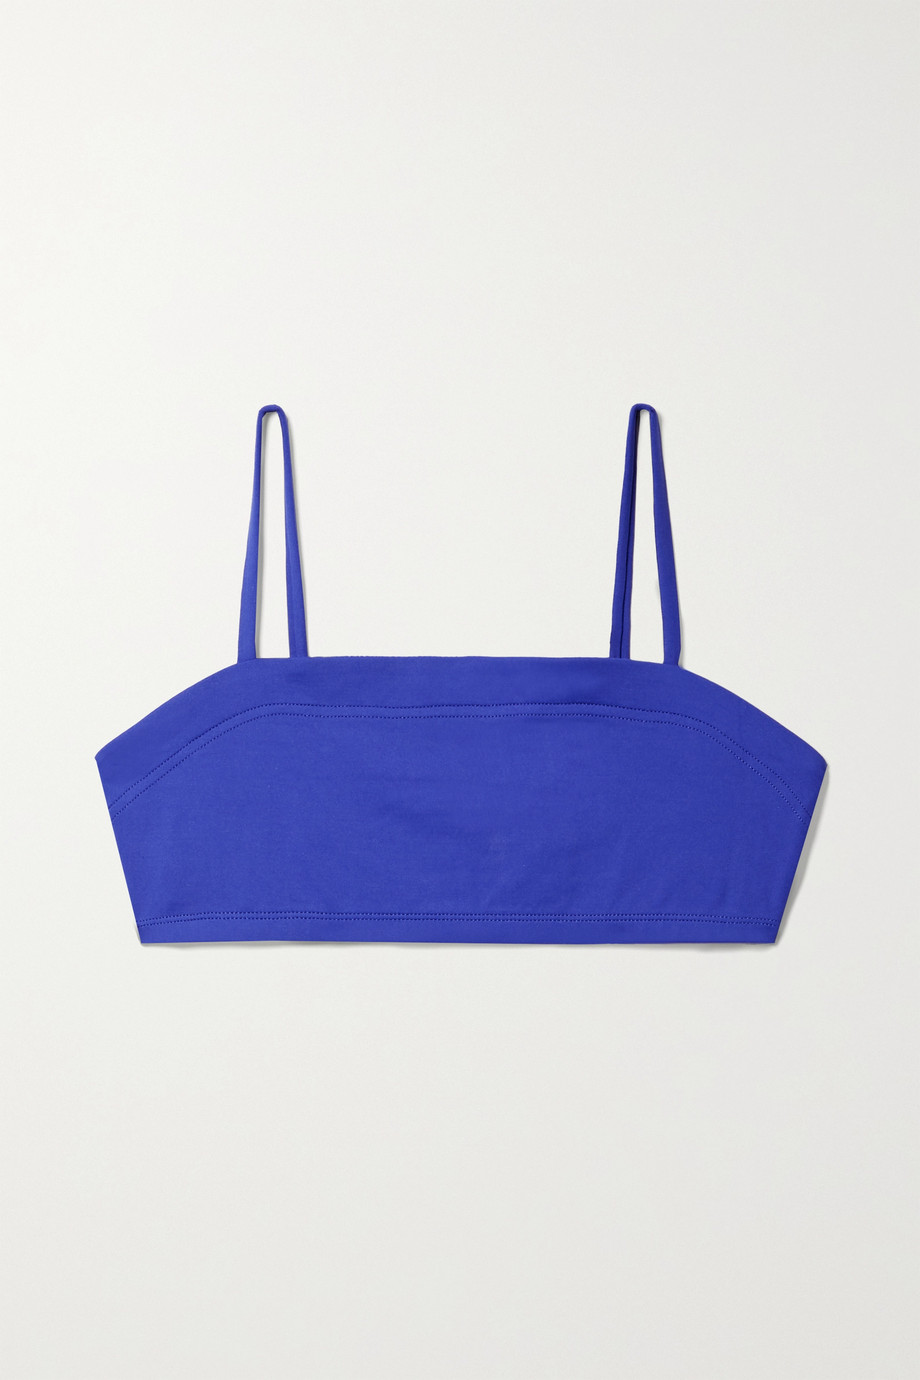 Eres Les Essentiels Azur bikini top